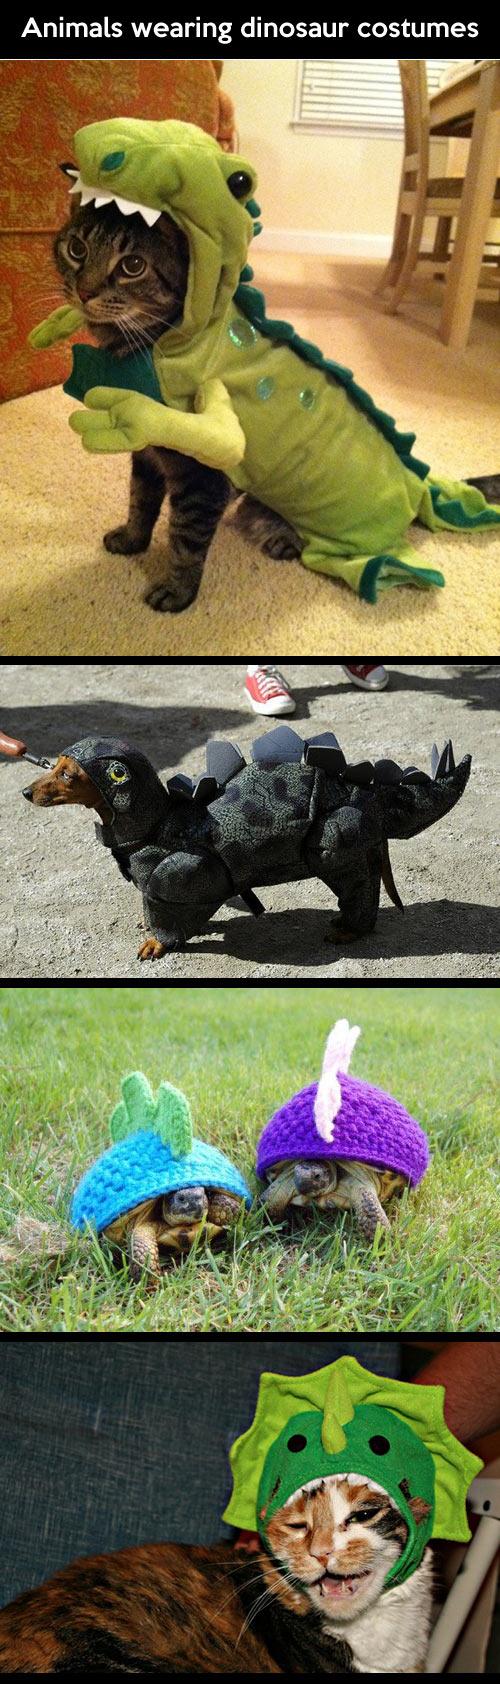 funny-animals-dinosaur-costumes-cat